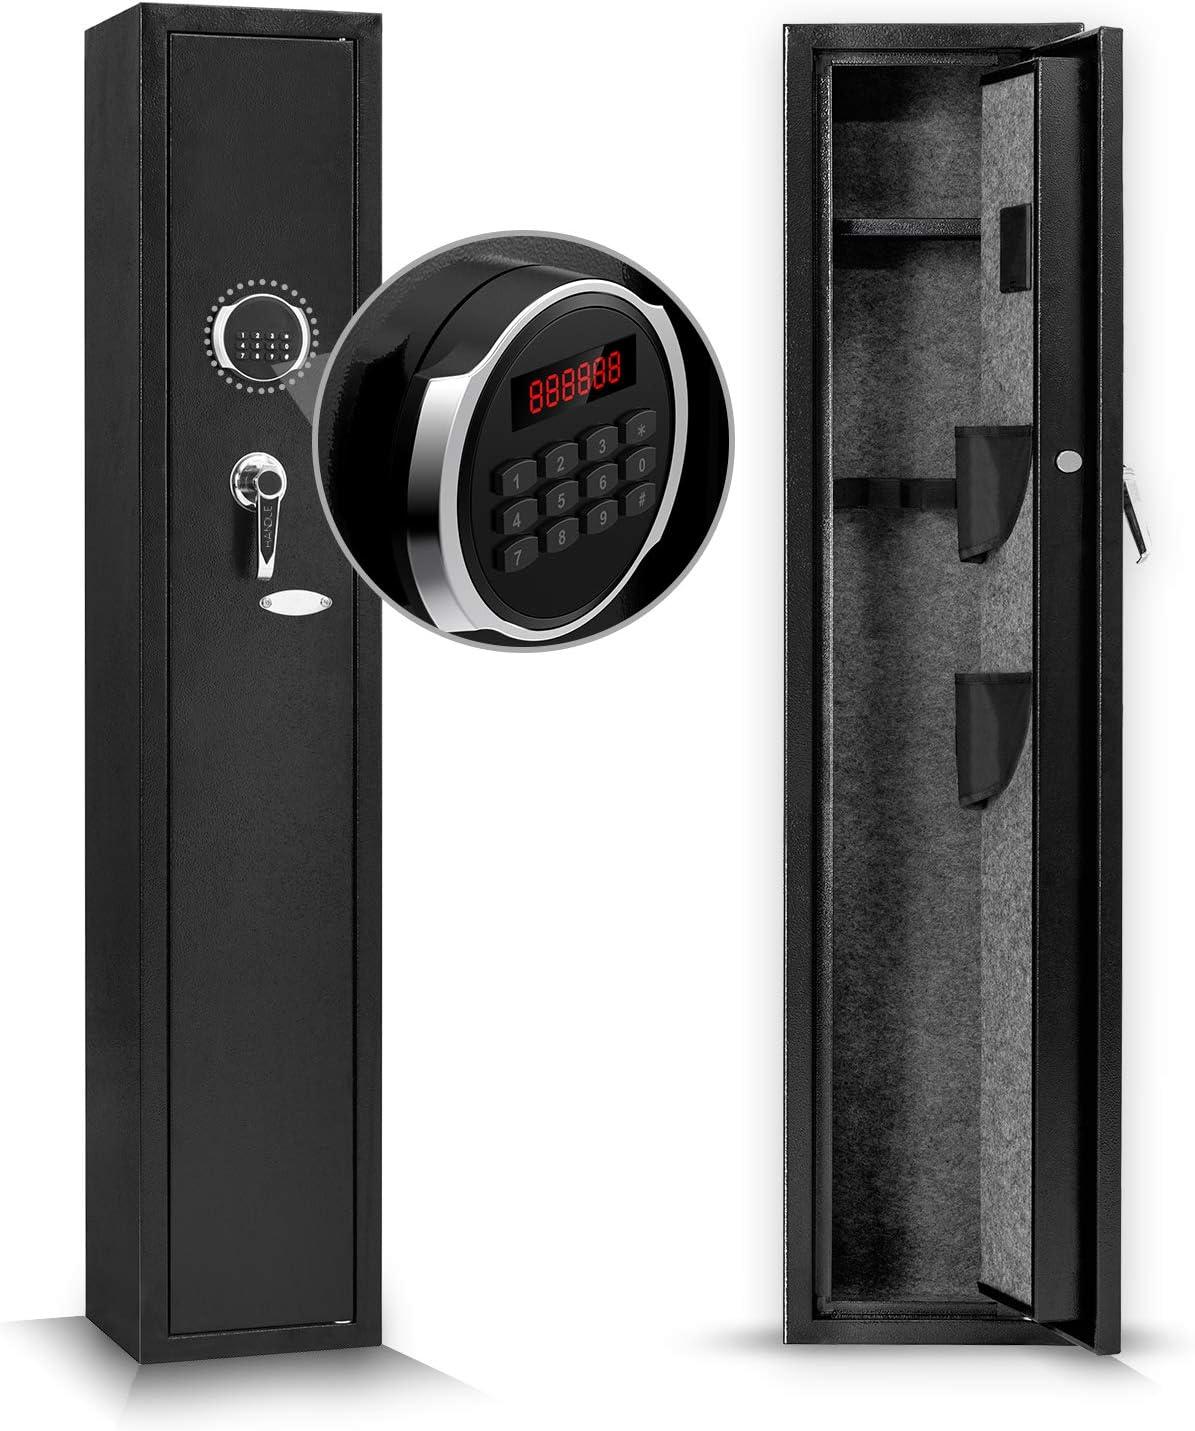 Large Biometric Fingerprint Rifle Security Cabinet,Smart Quick Access Indoor Home 4 Gun Safe Lock Storage Ammunition Handgun Firearms